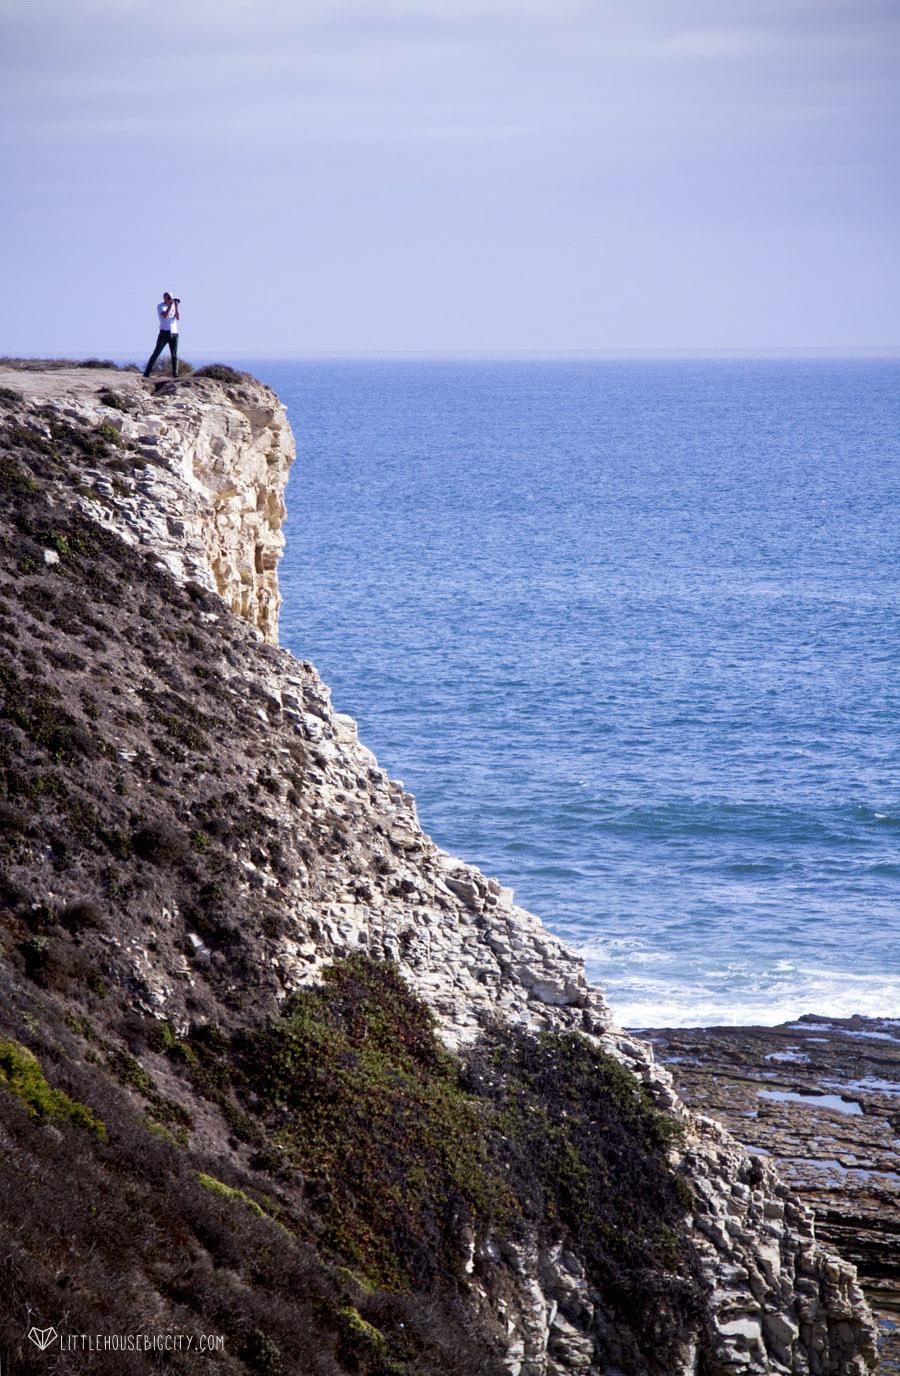 Eli filming the coast line along US 1